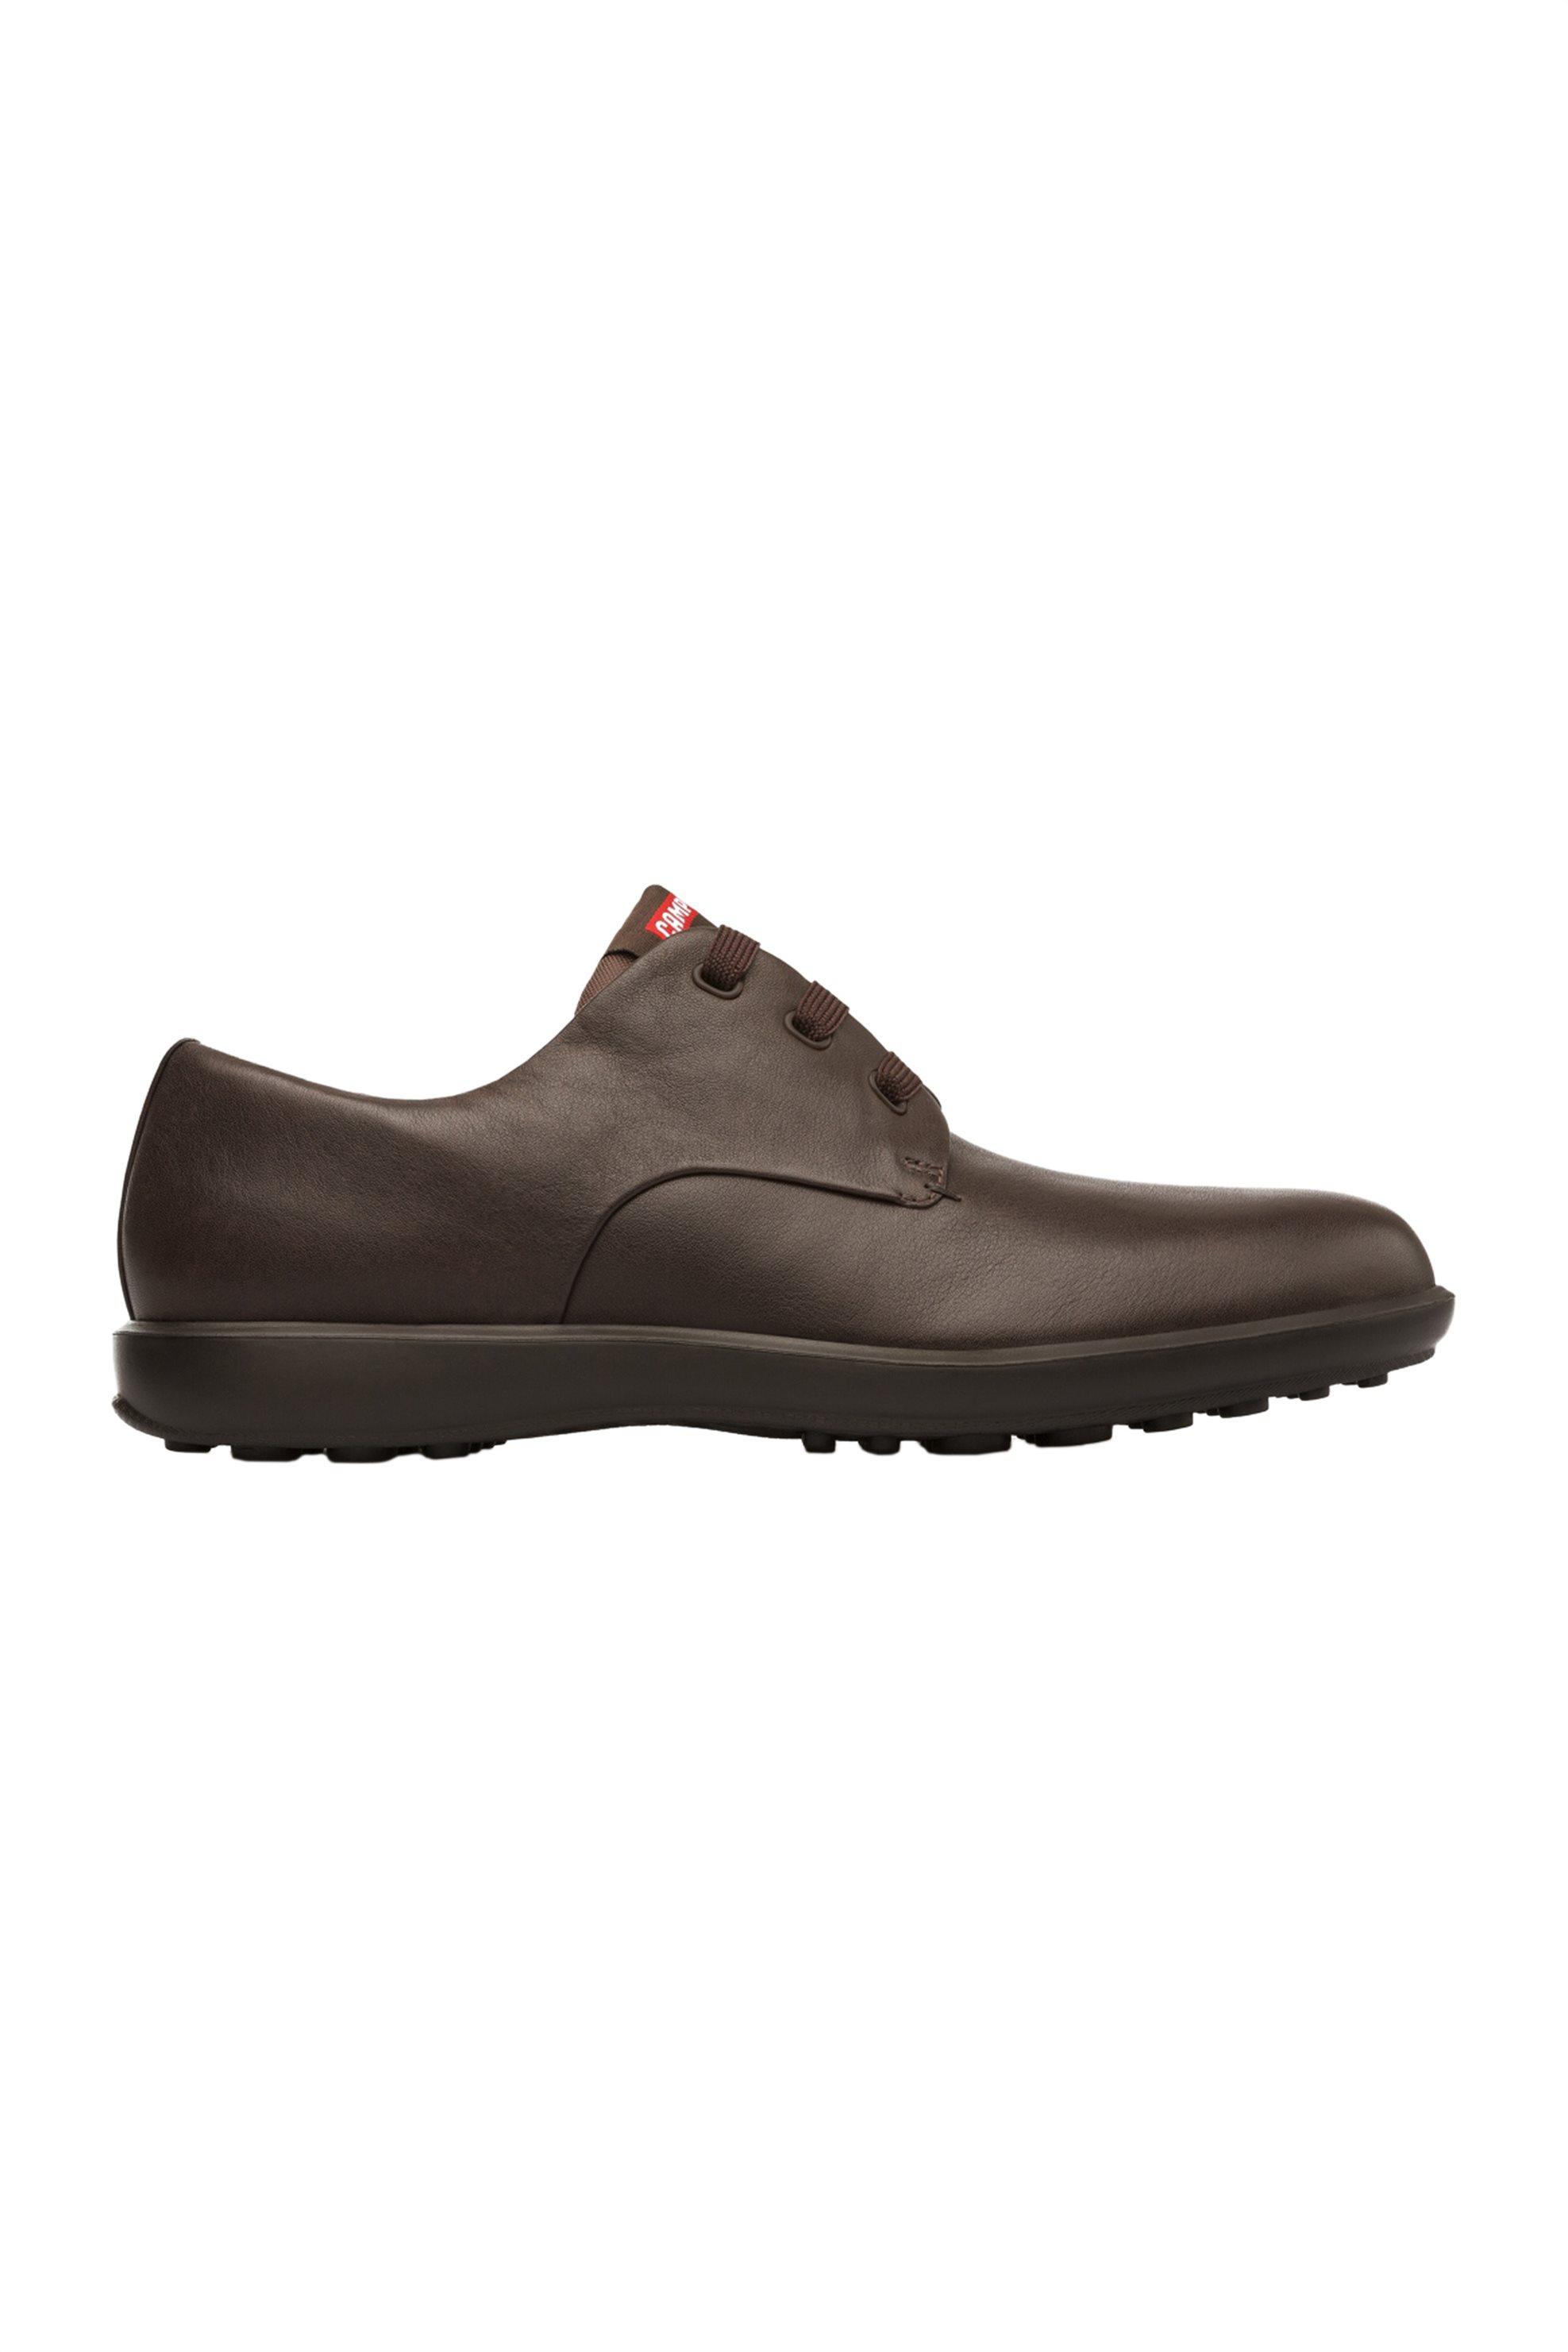 Camper ανδρικά δερμάτινα παπούτσια Atom Work – 18637-036 – Καφέ